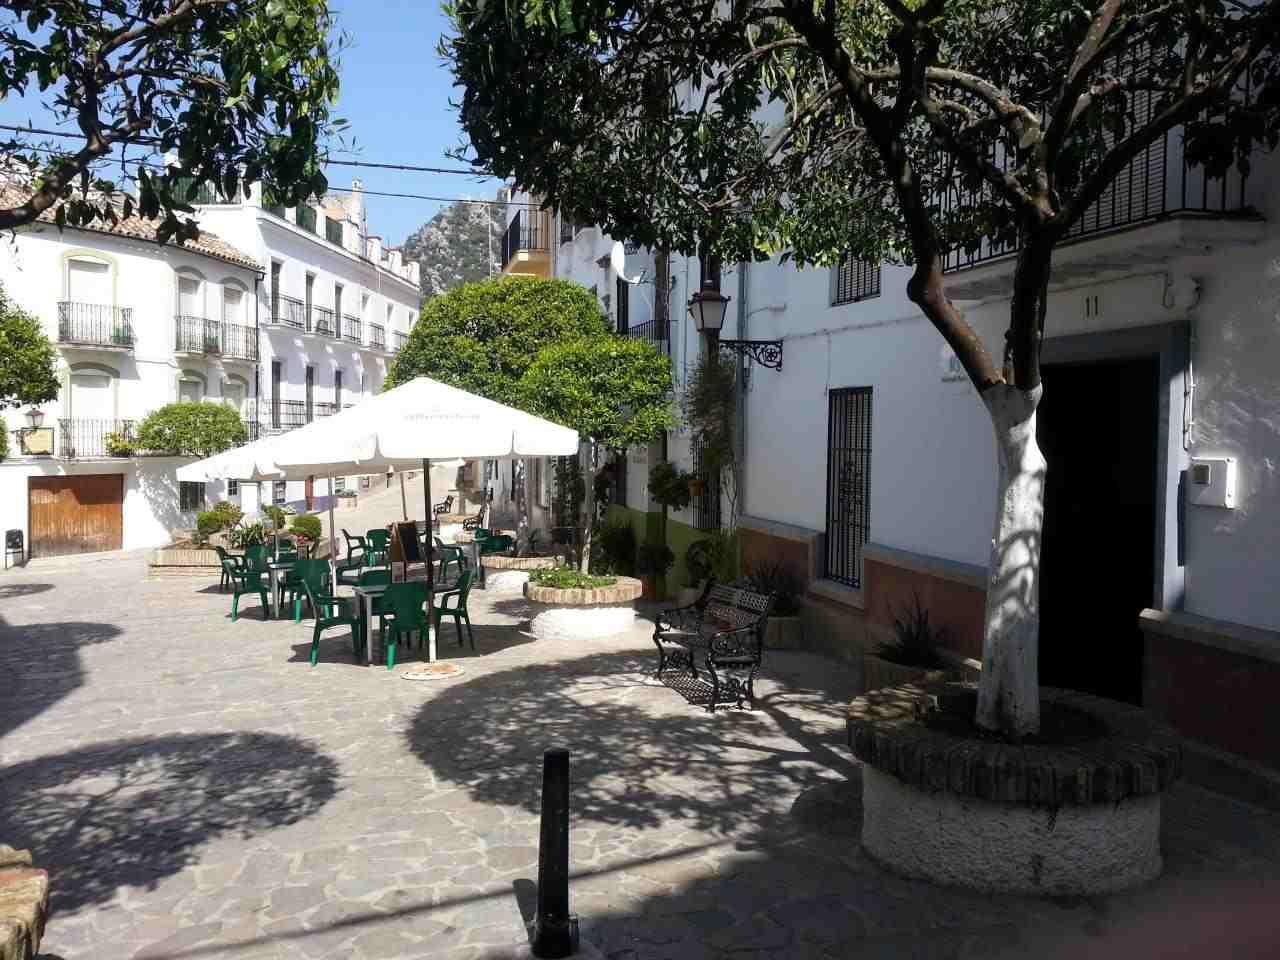 Pisos  alquiler Ubrique, Cádiz